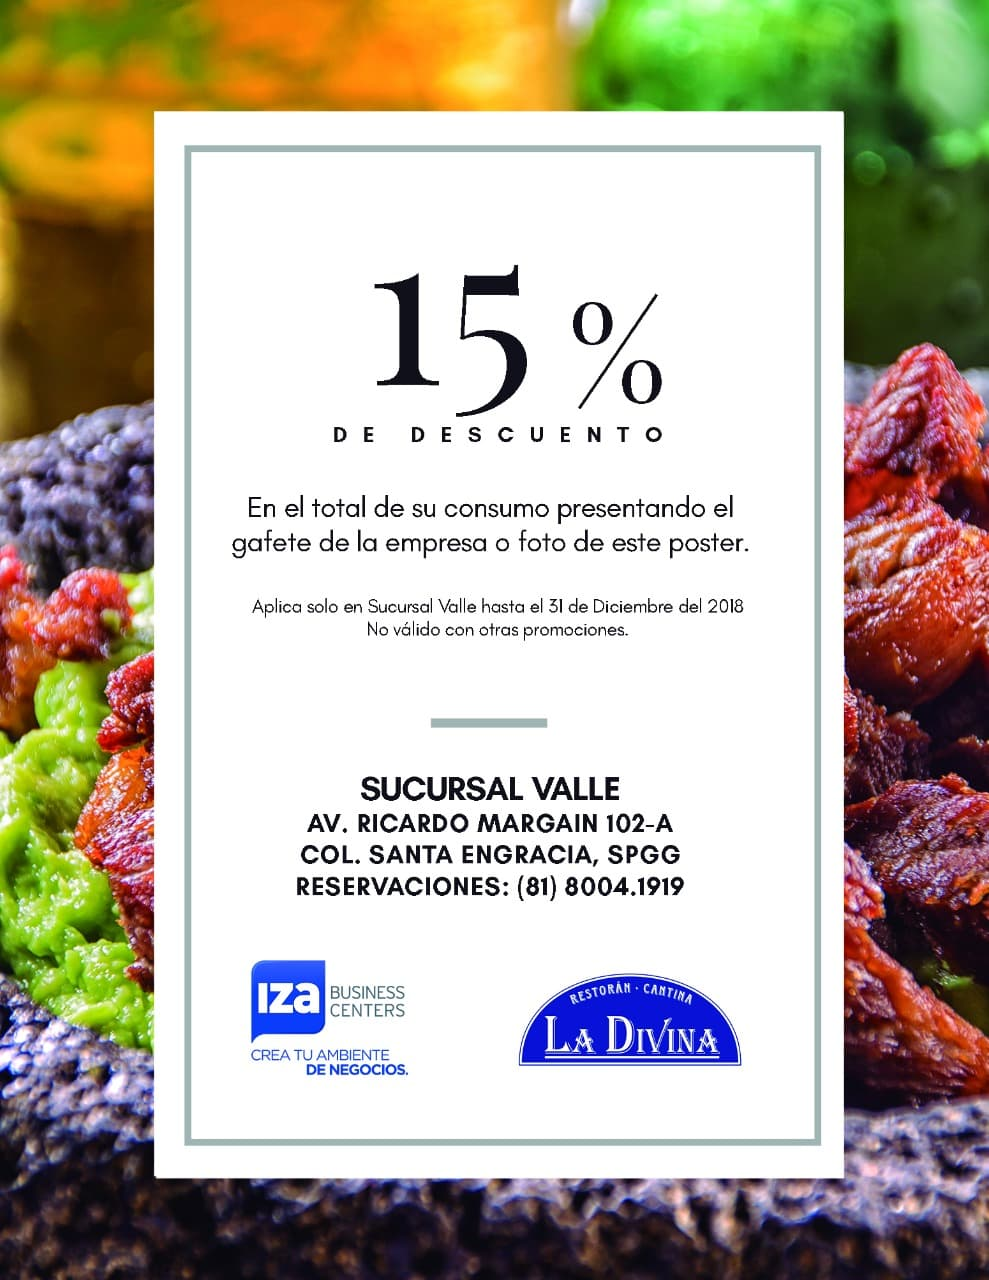 La Divina Restoran Cantina IZA Business Centers Te Consiente (2)-1